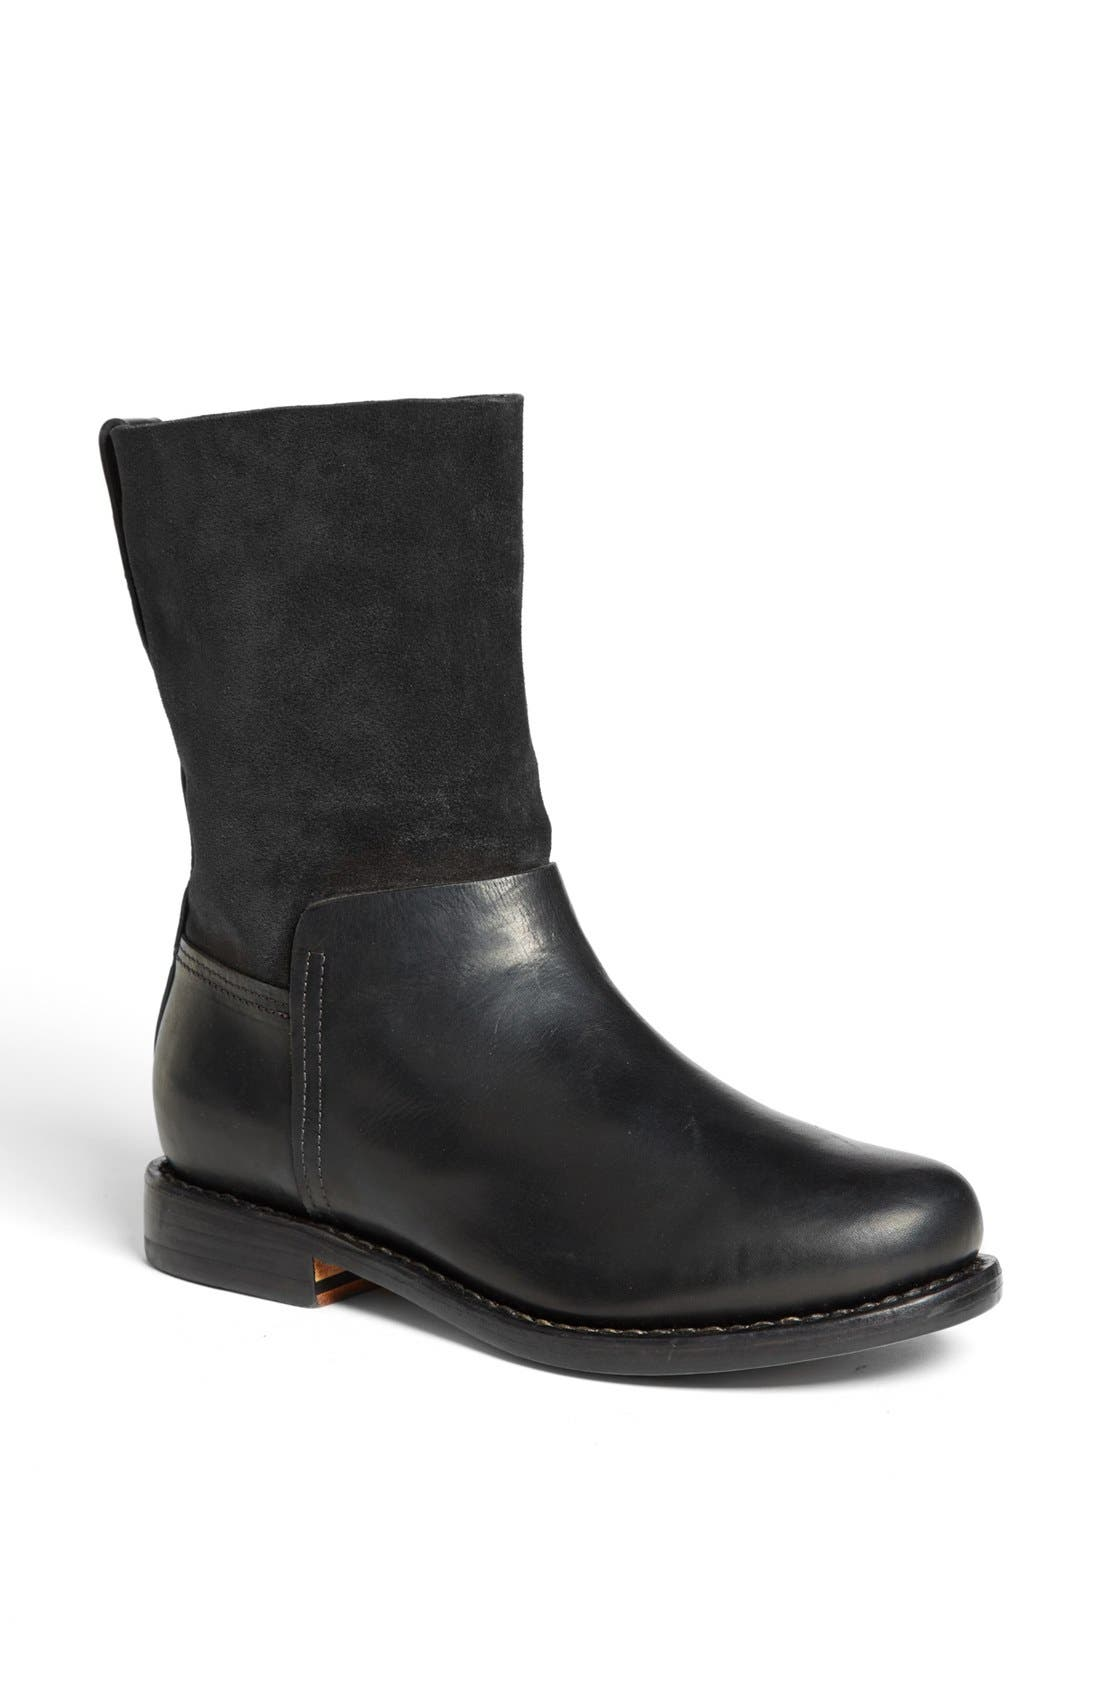 Main Image - rag & bone 'Highland' Boot